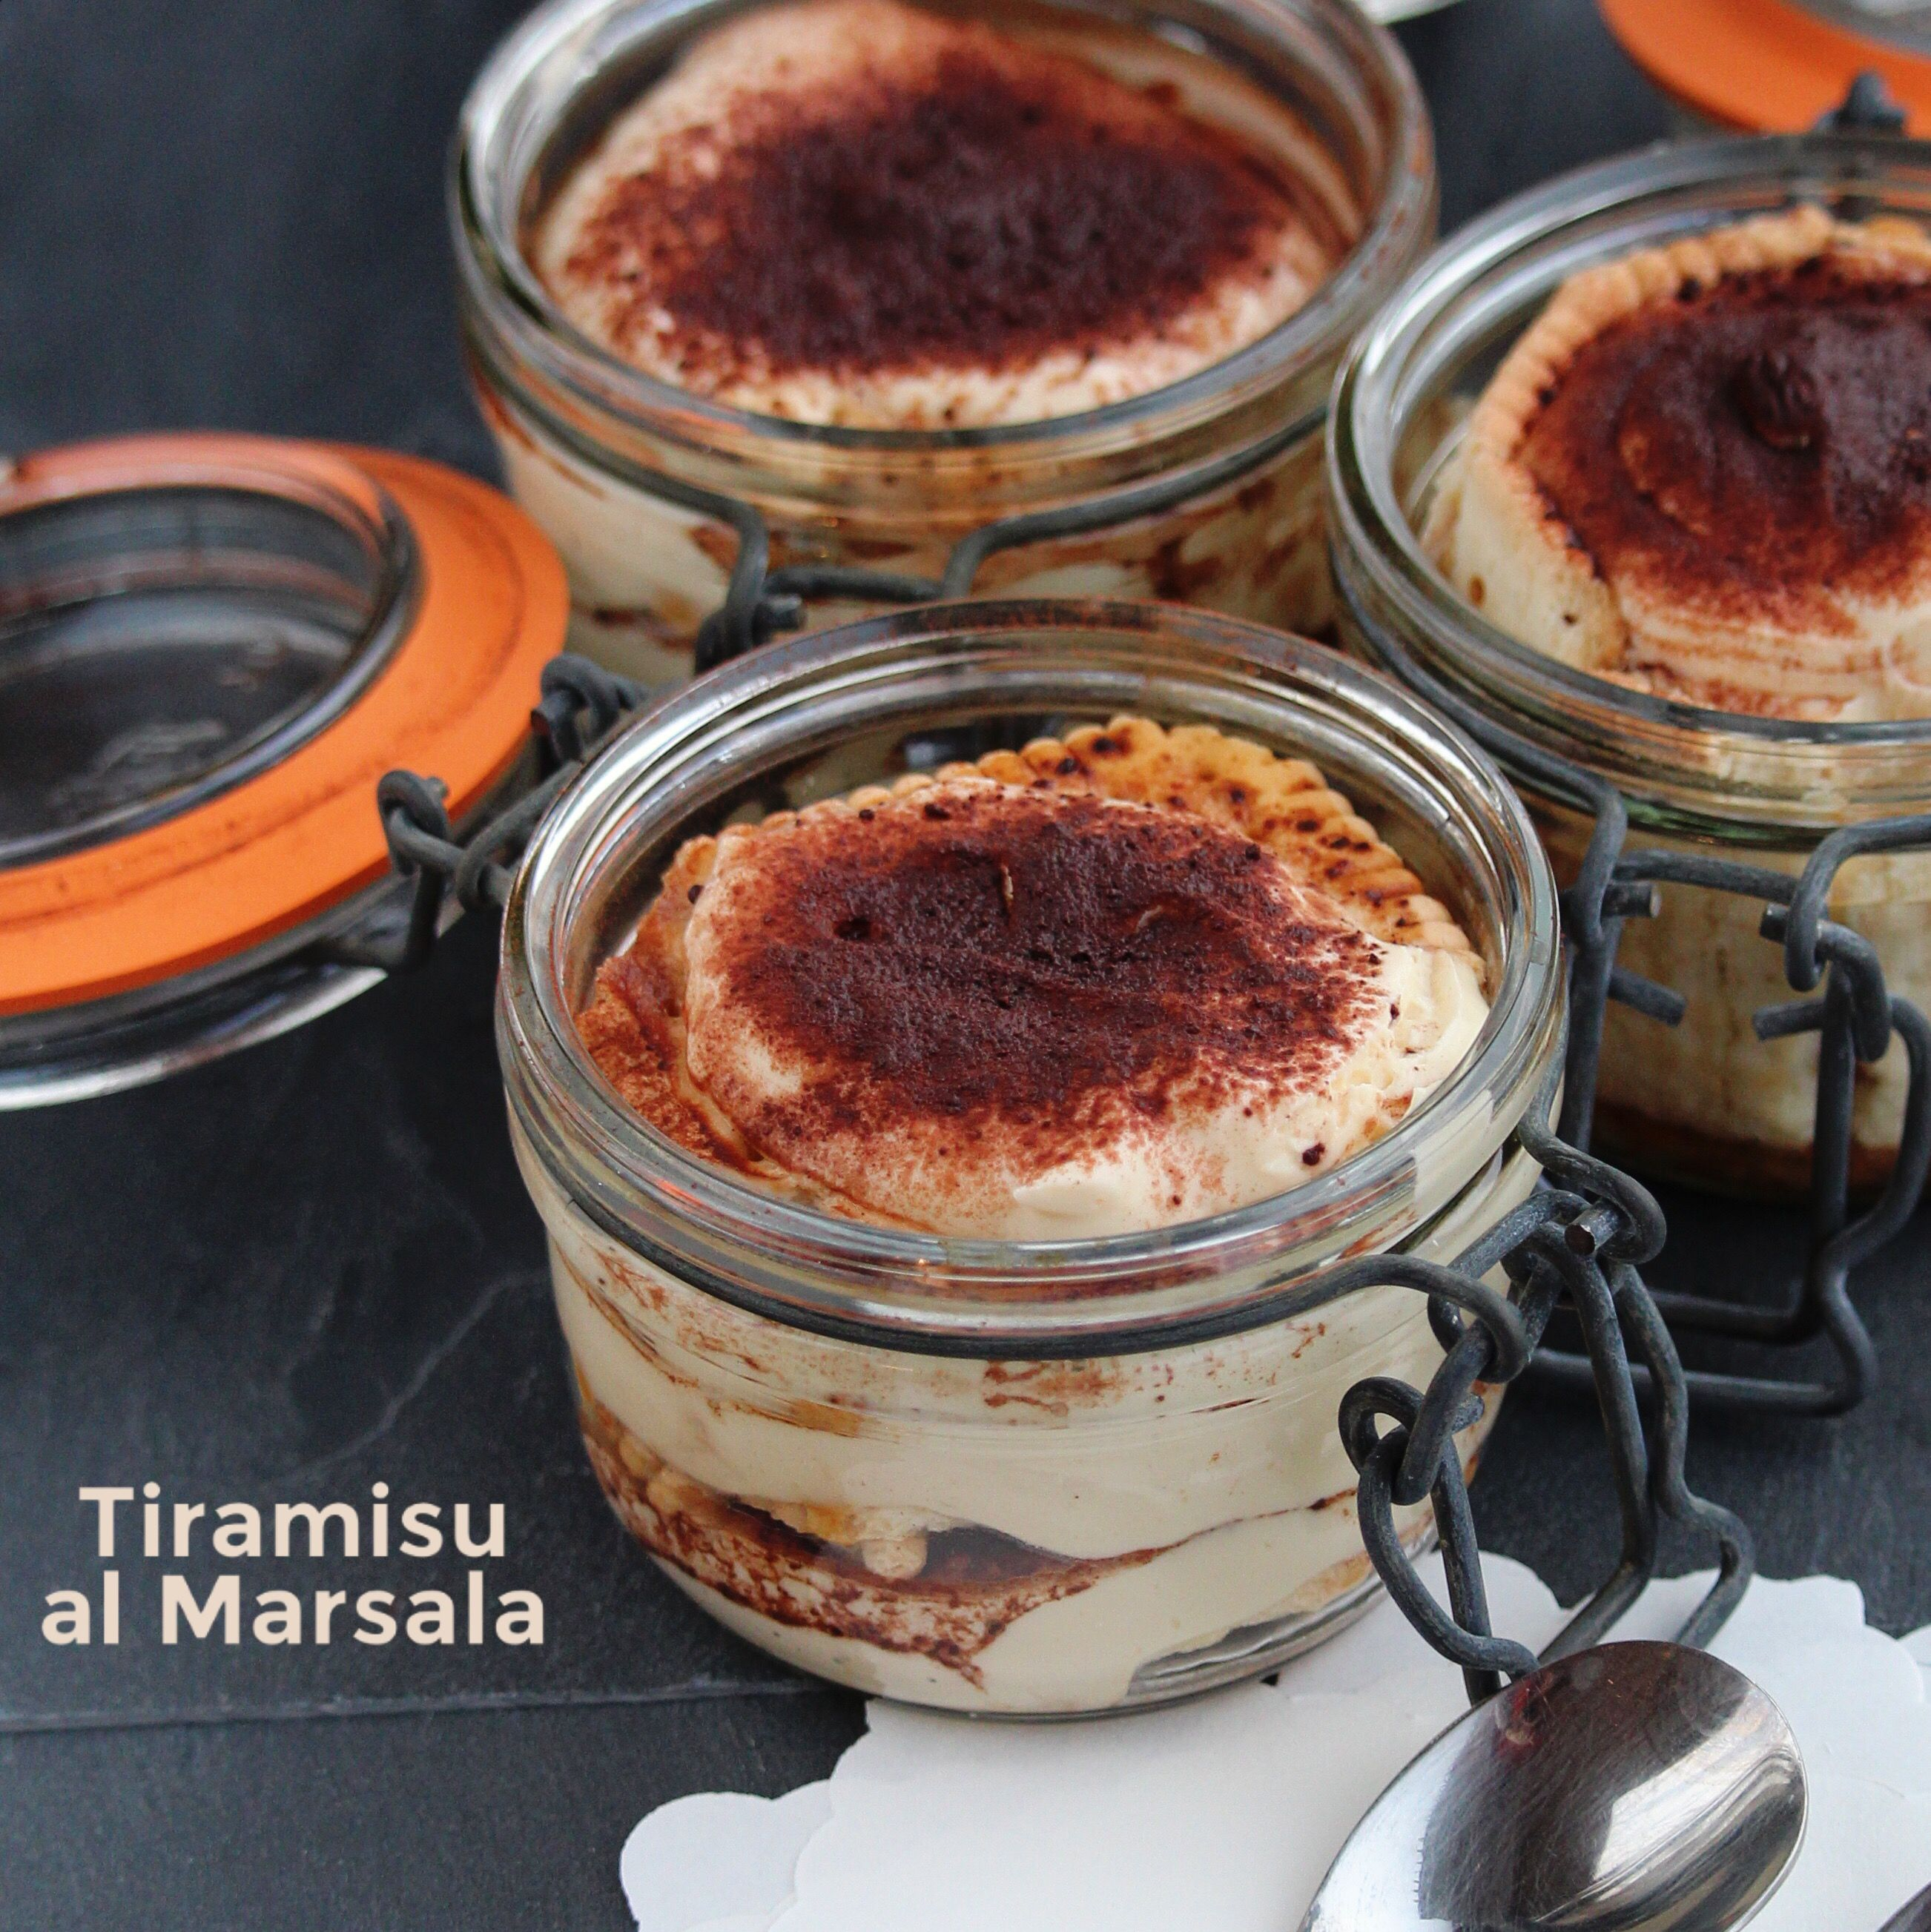 Tiramisu al Marsala #myallrecipes #allrecipesallstars #glutenfree #tiramisu #allrecipesfaceless